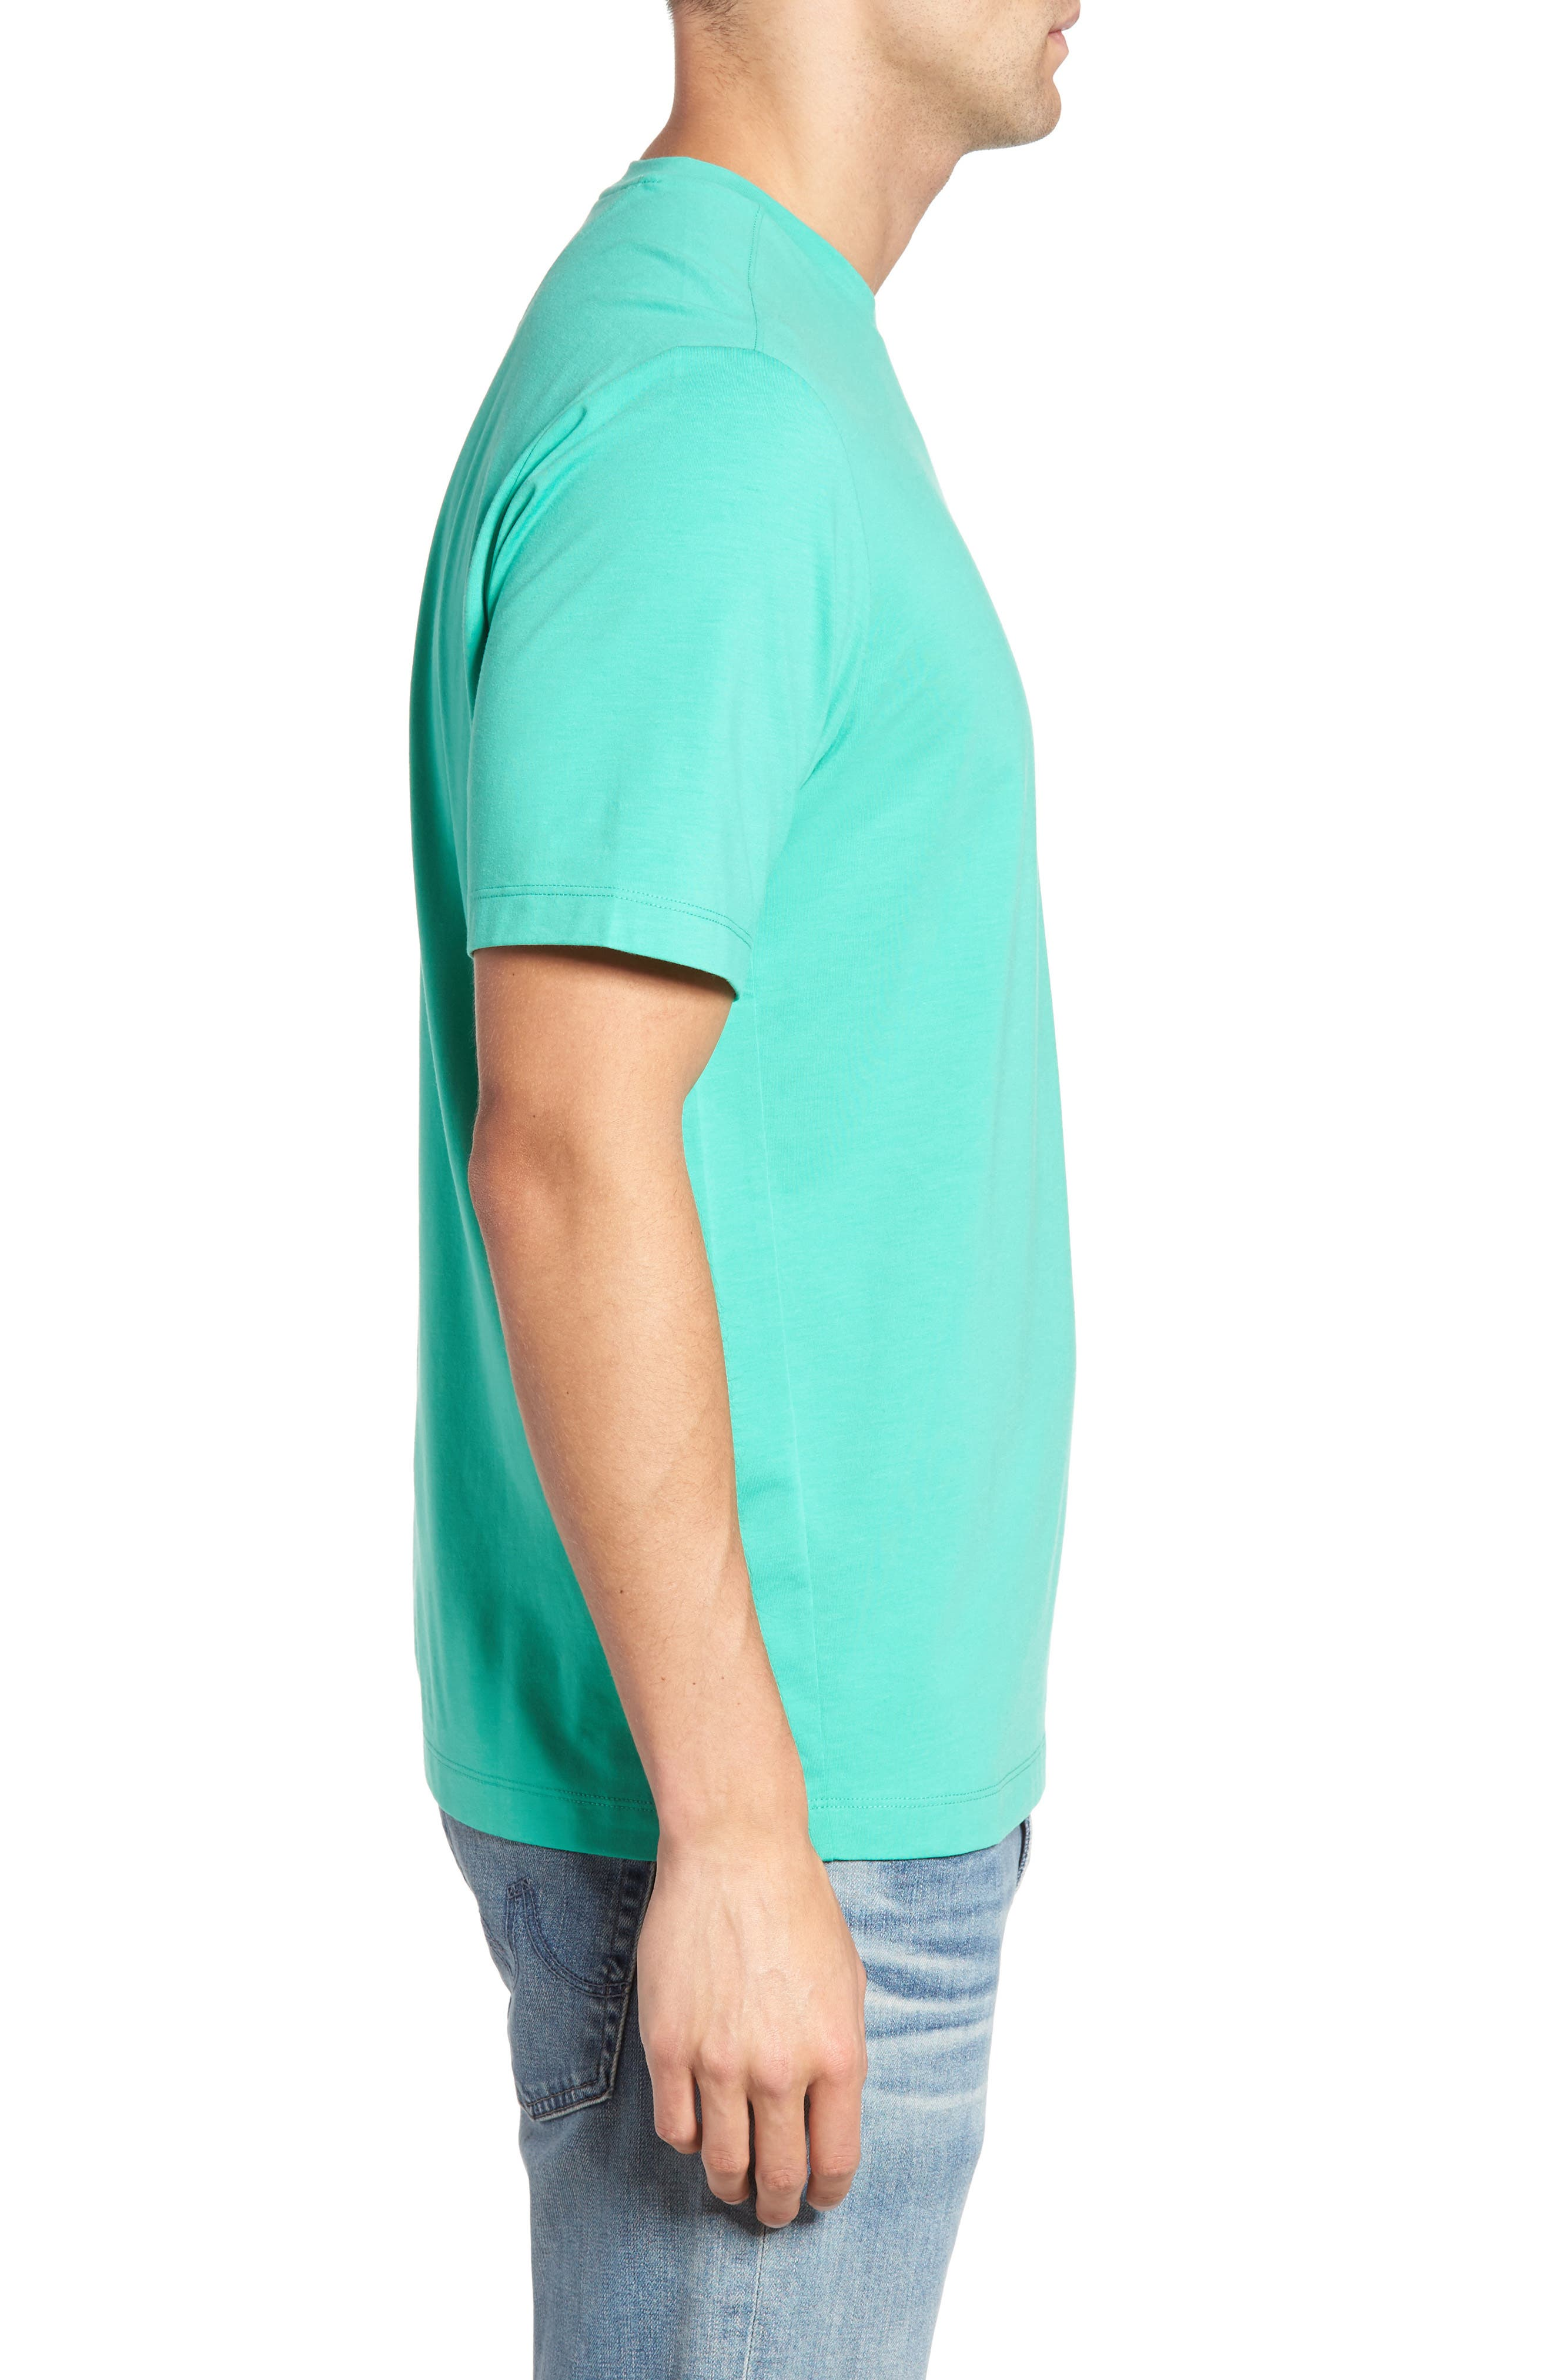 Tropicool T-Shirt,                             Alternate thumbnail 26, color,